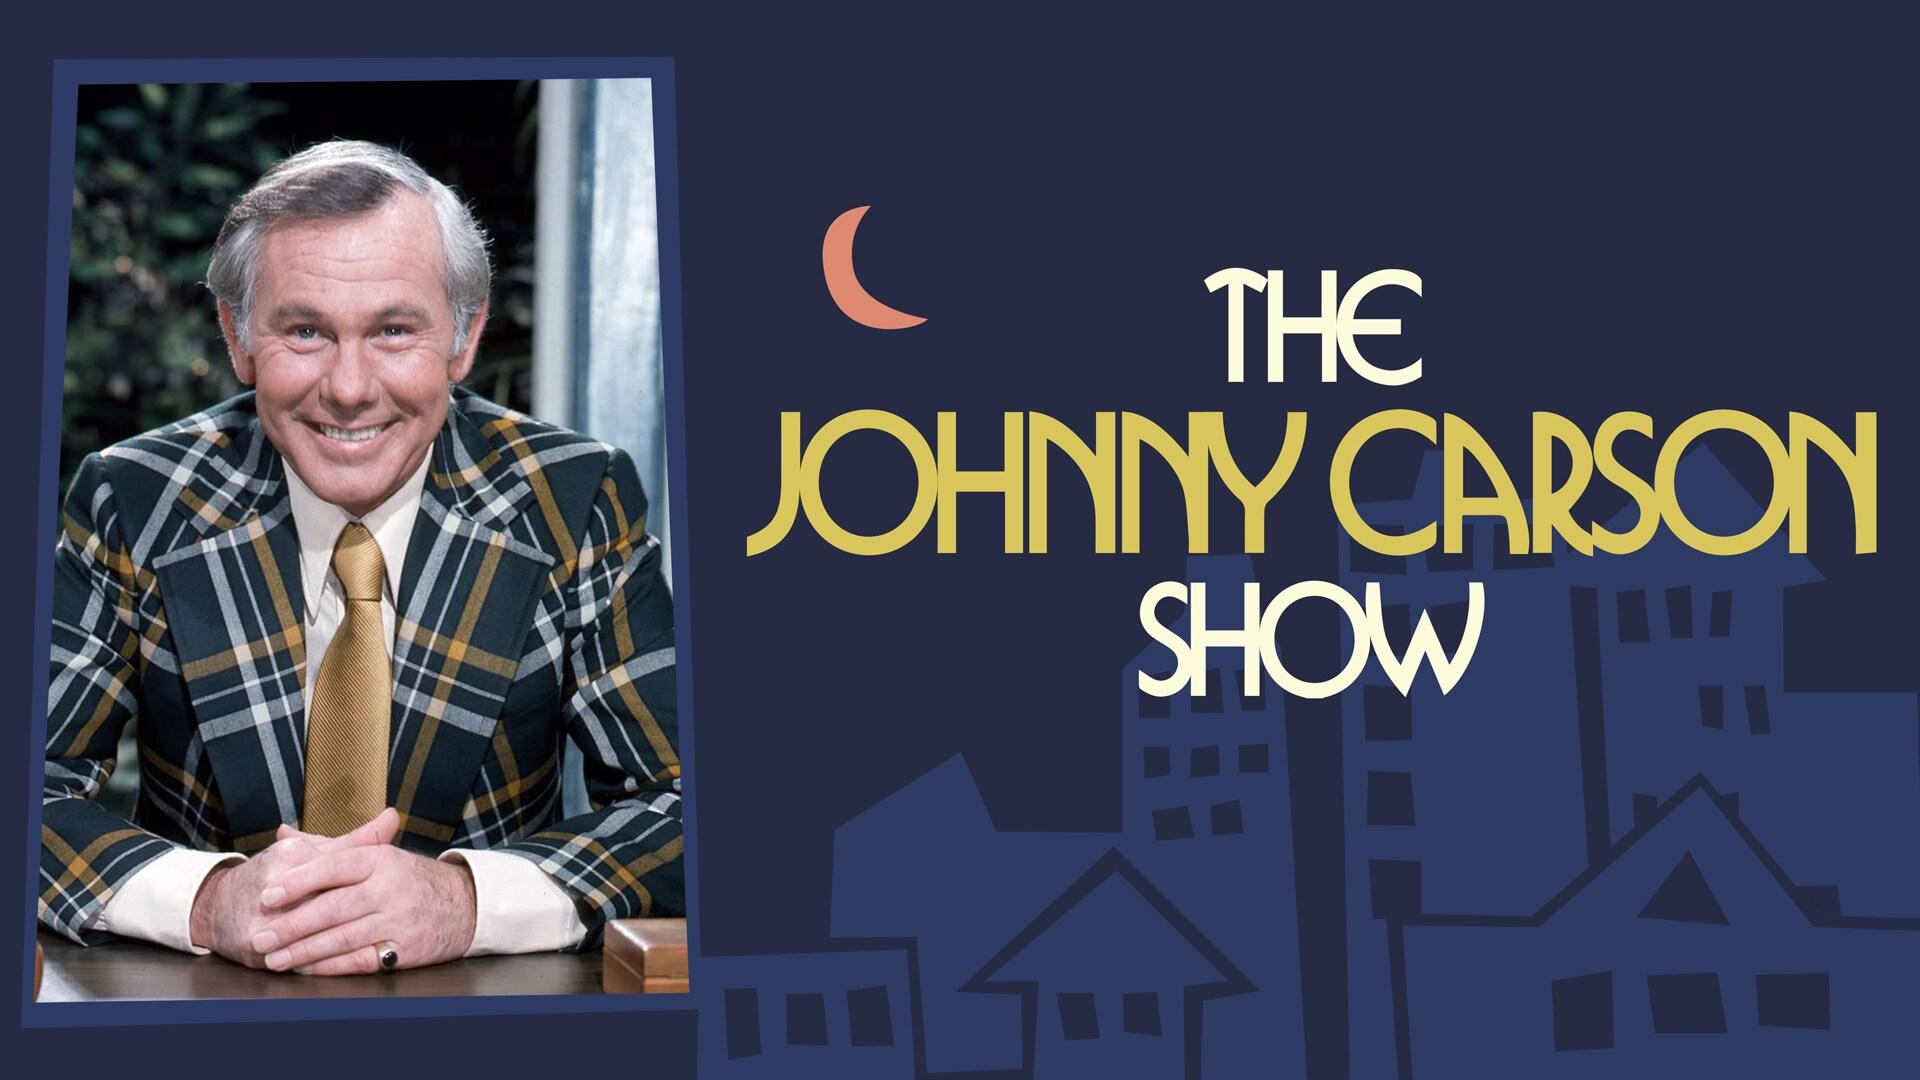 The Johnny Carson Show: Animal Antics With Joan Embery (4/25/86)